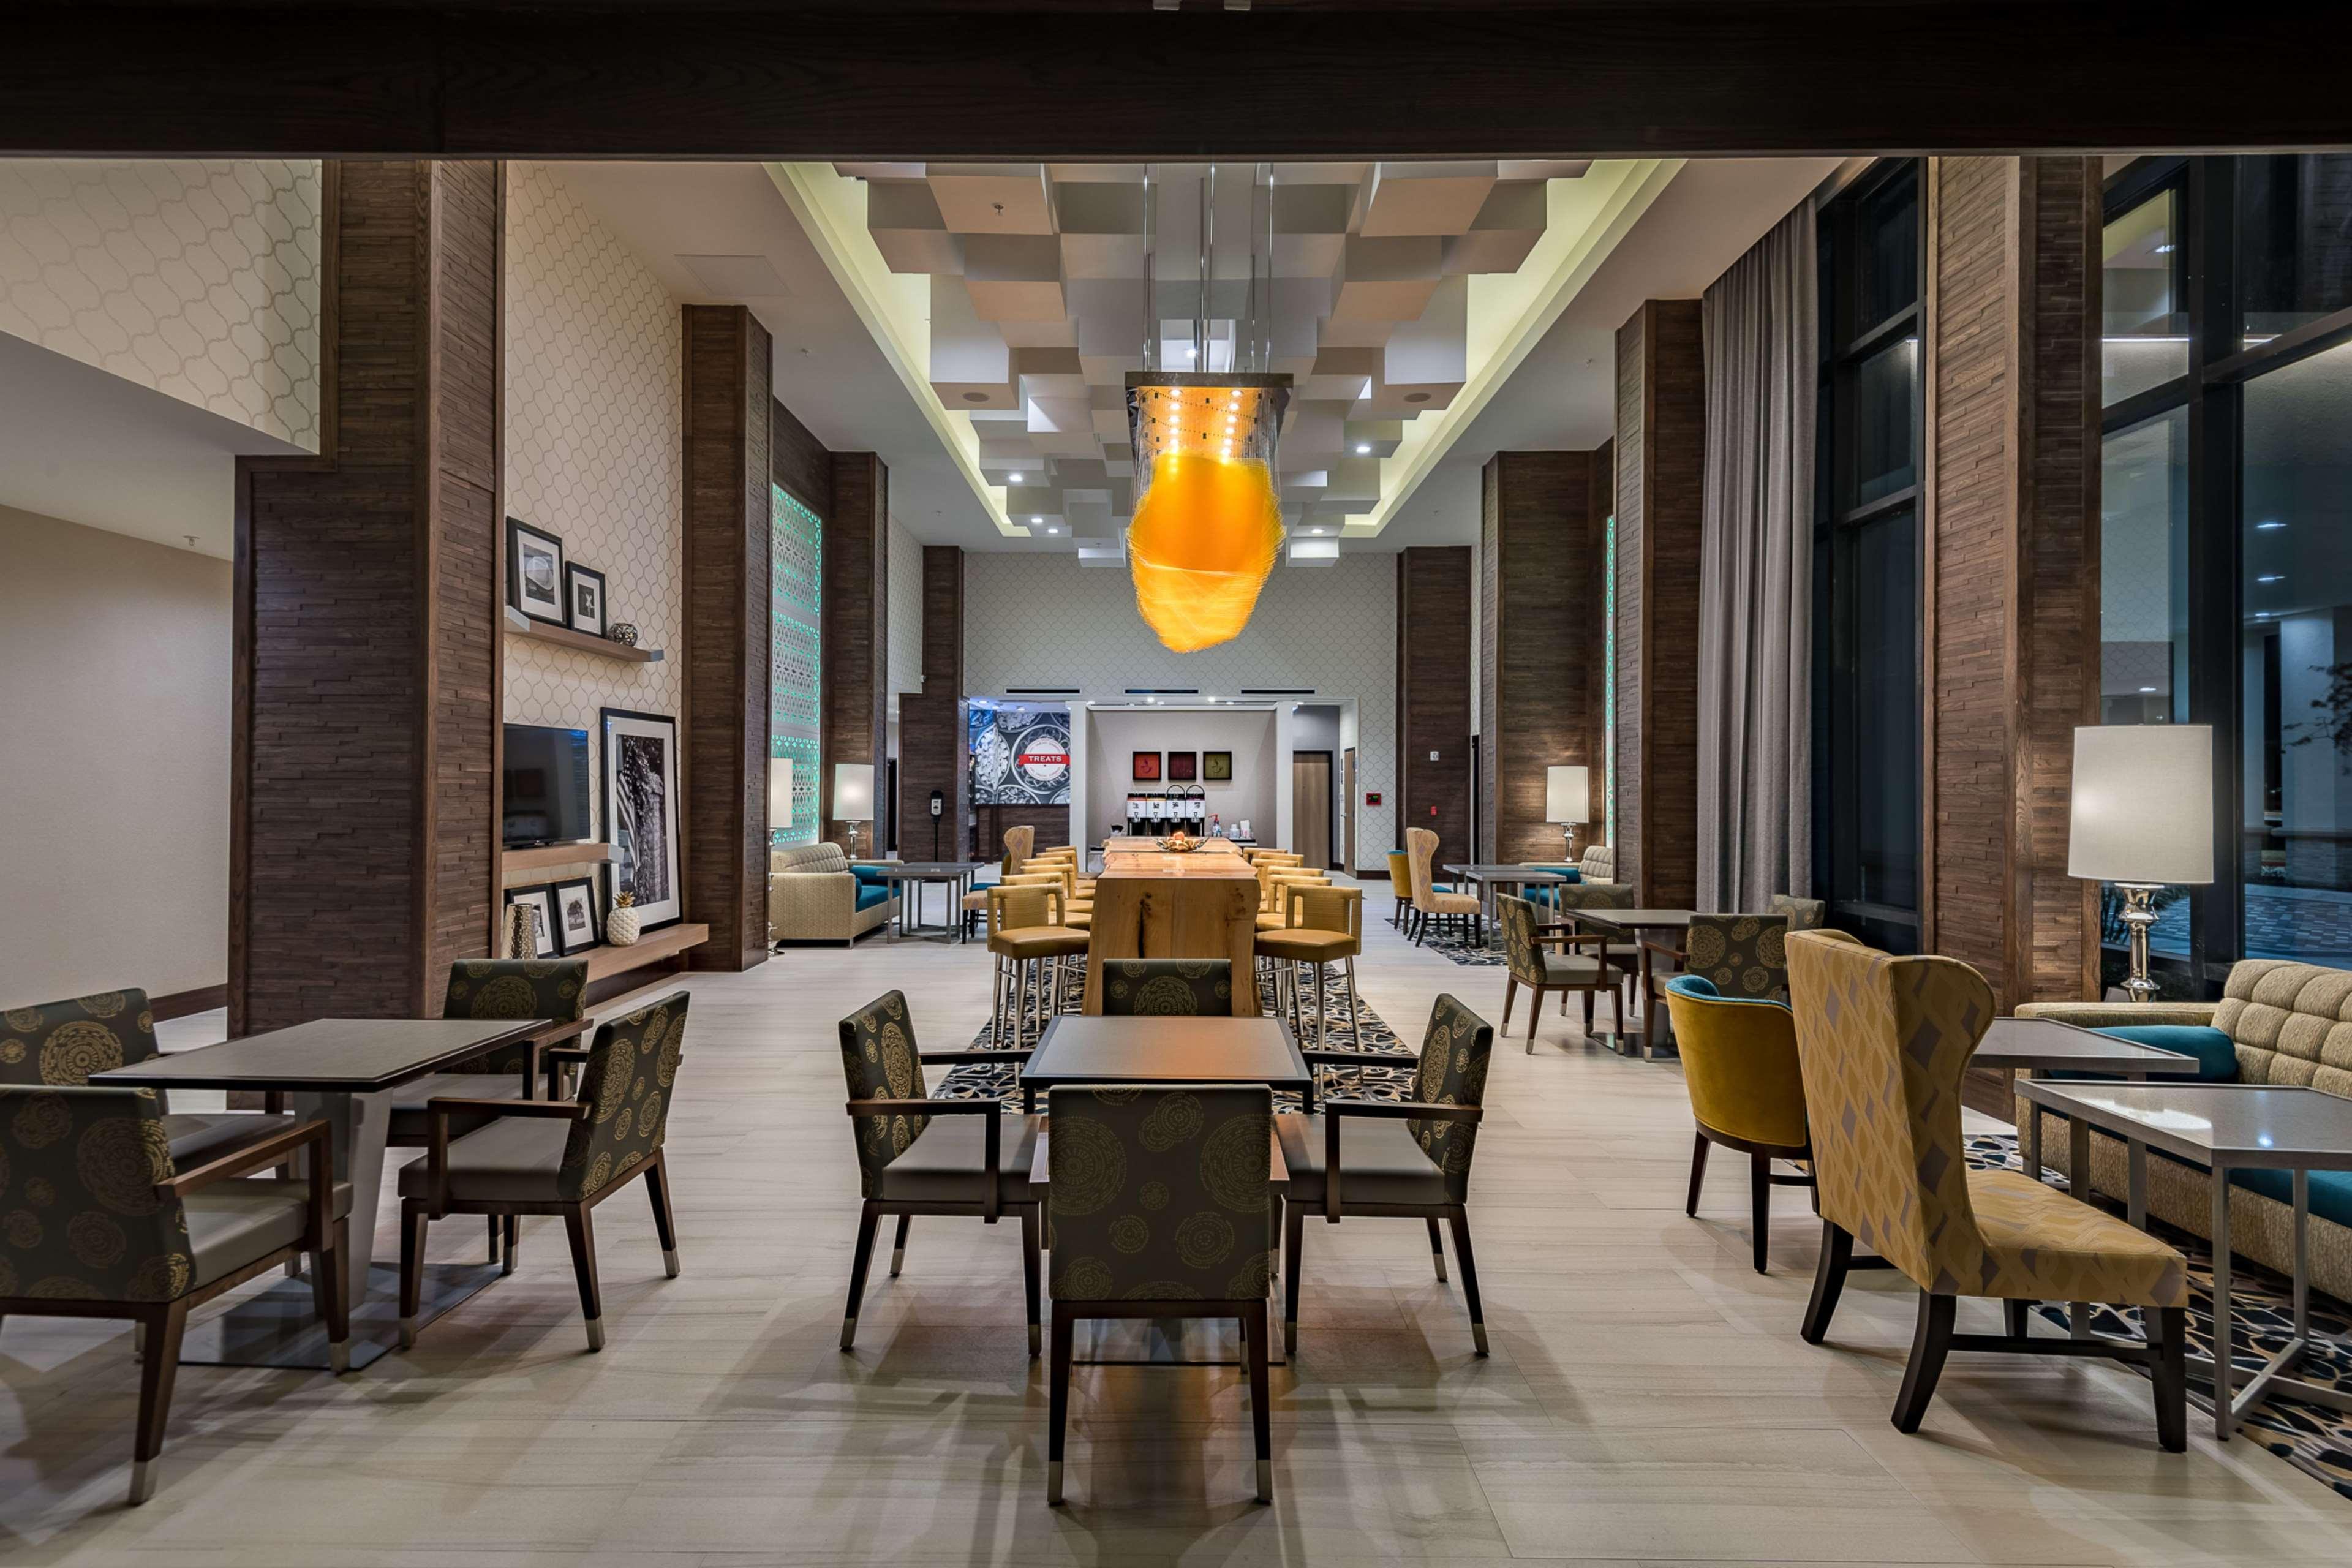 Hampton Inn & Suites Dallas-The Colony, TX image 6